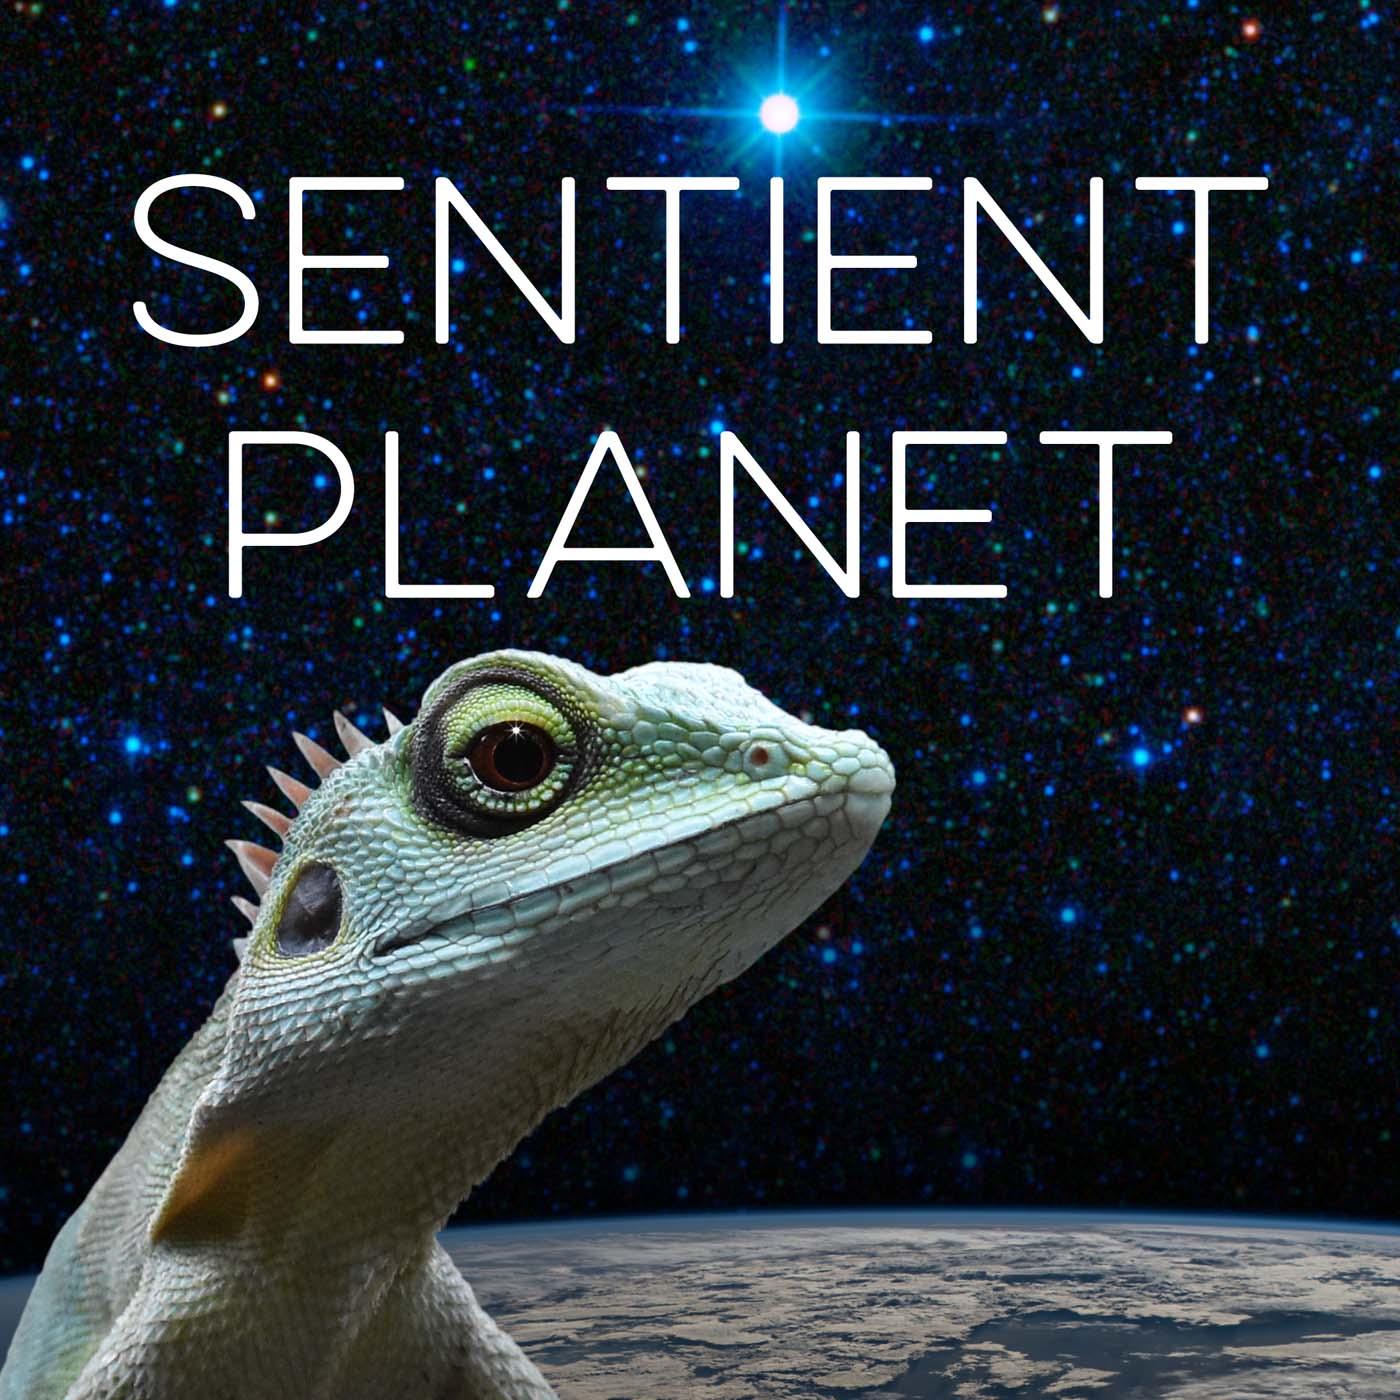 Sentient-Planet-Podcast